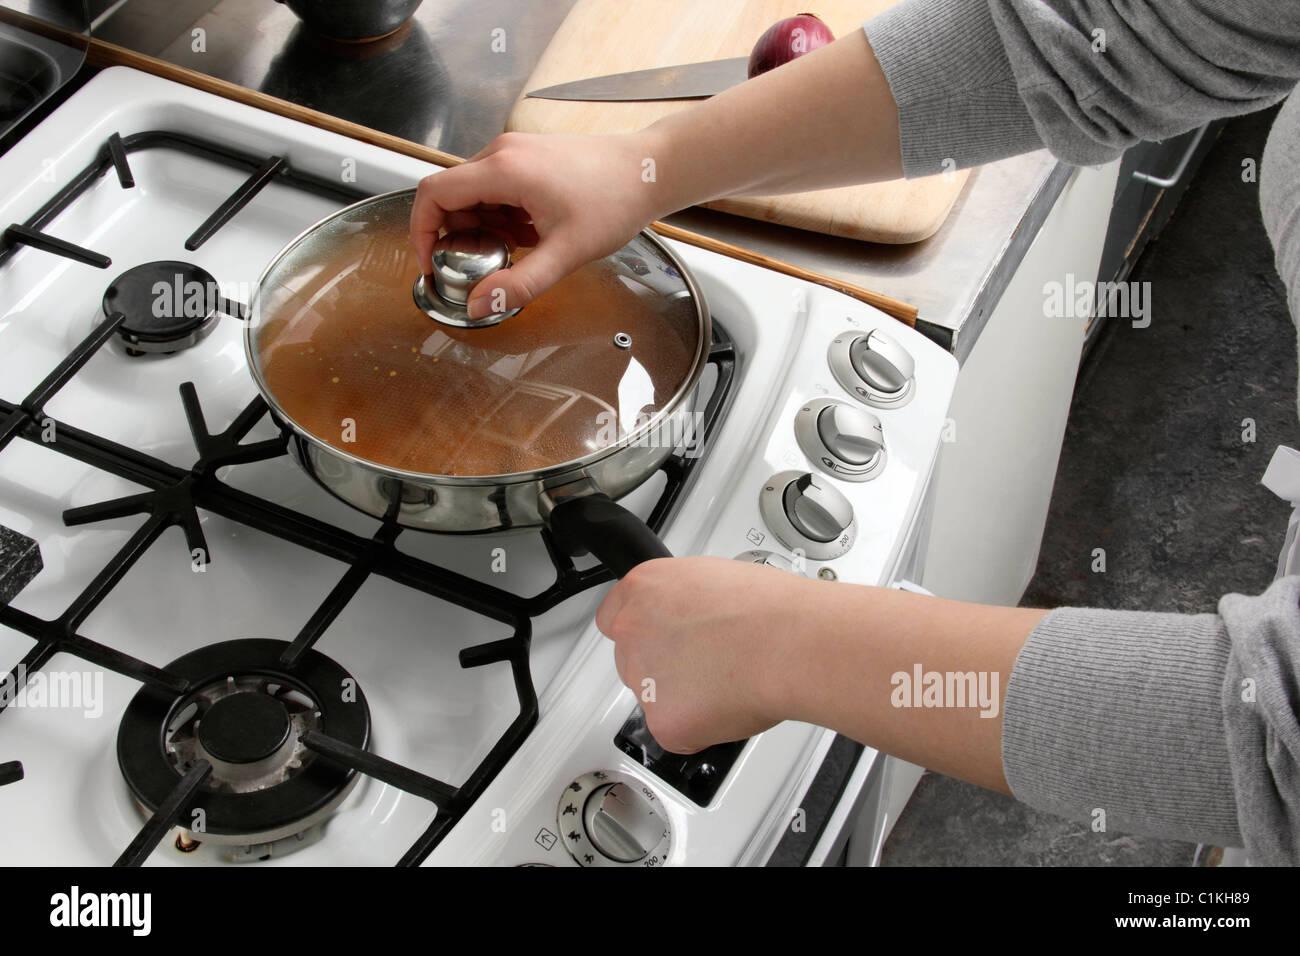 Putting a lid on a saucepan of simmering chicken rogan josh - Stock Image